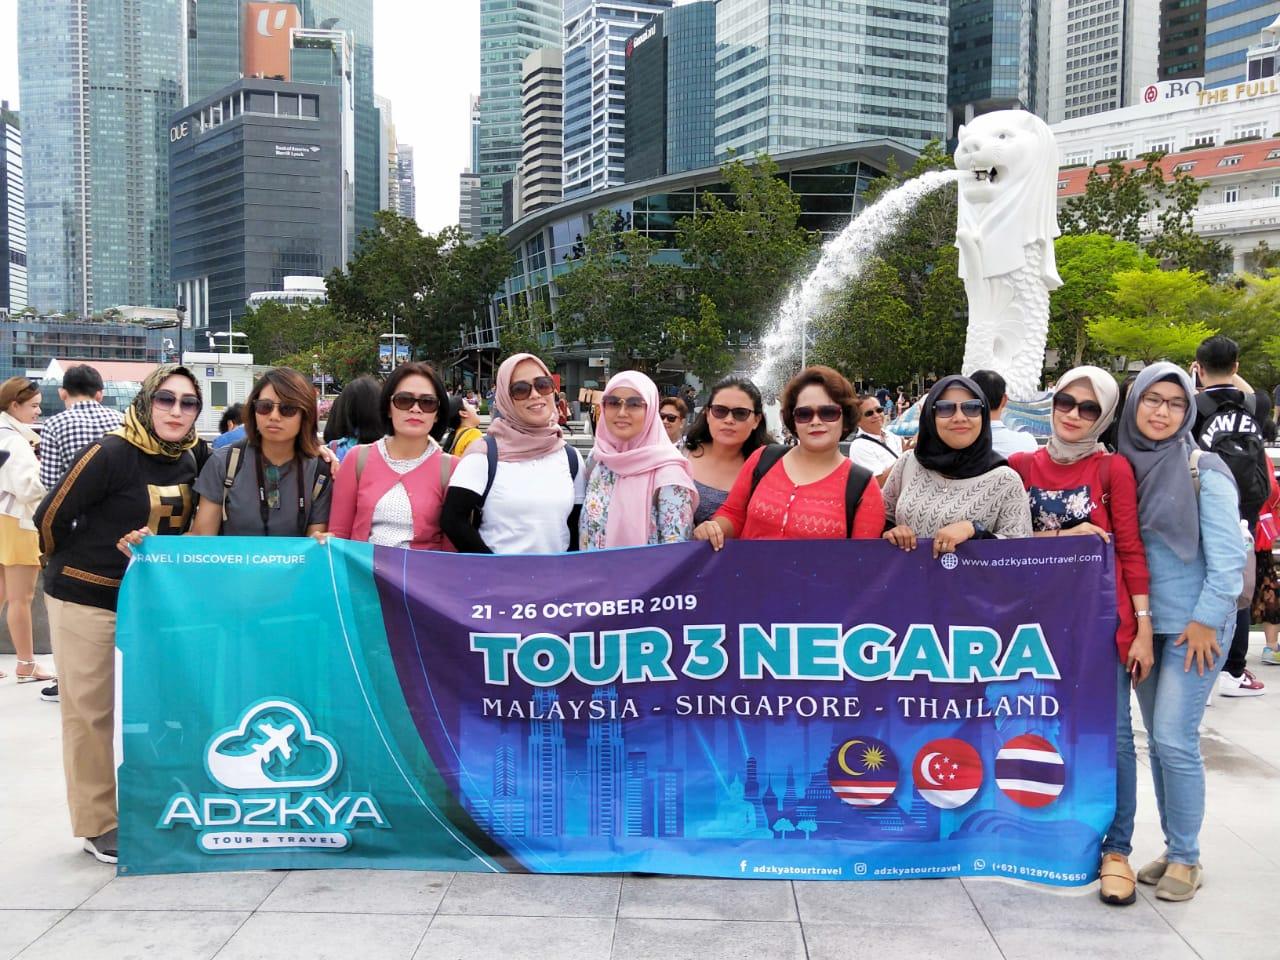 TOUR3 NEGARA (SIN-KL-THAI) 21 - 26 OKT 2019